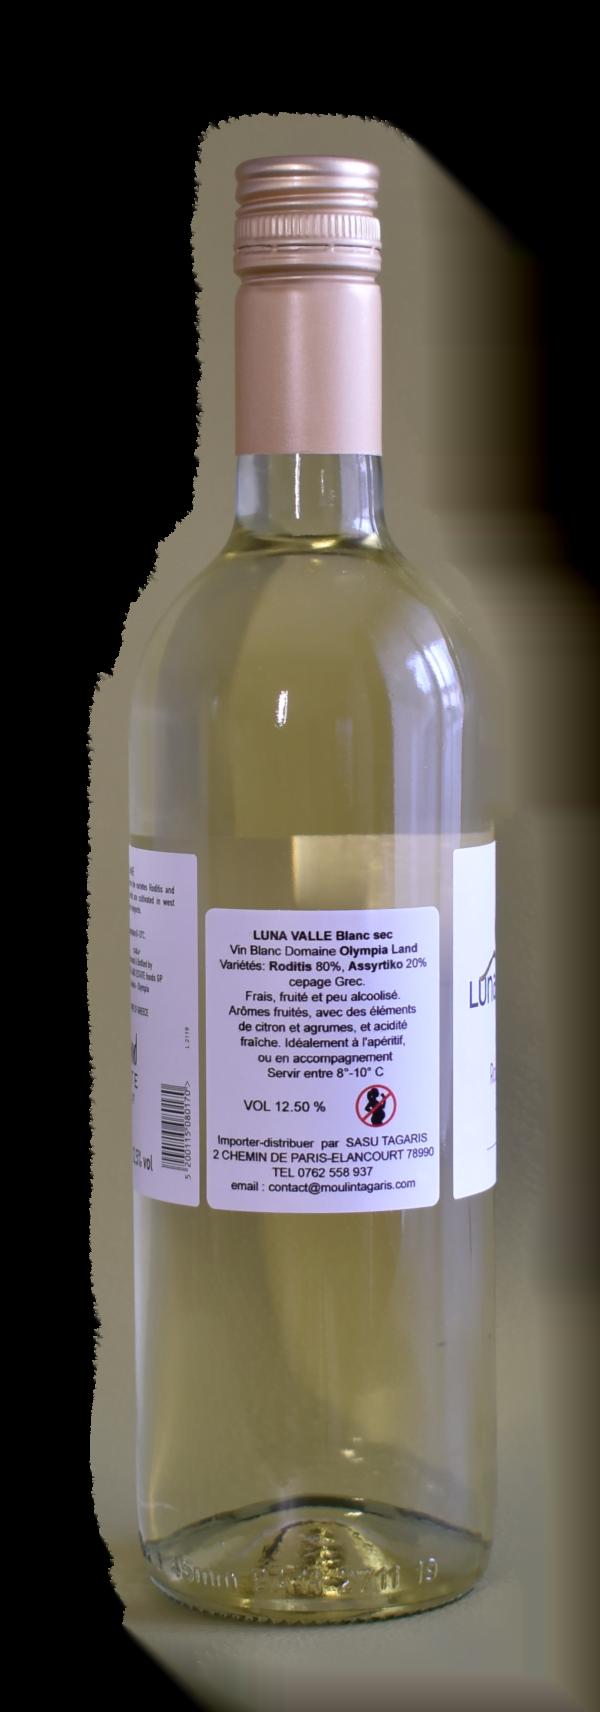 luna-valle vin 19-moulin tagaris